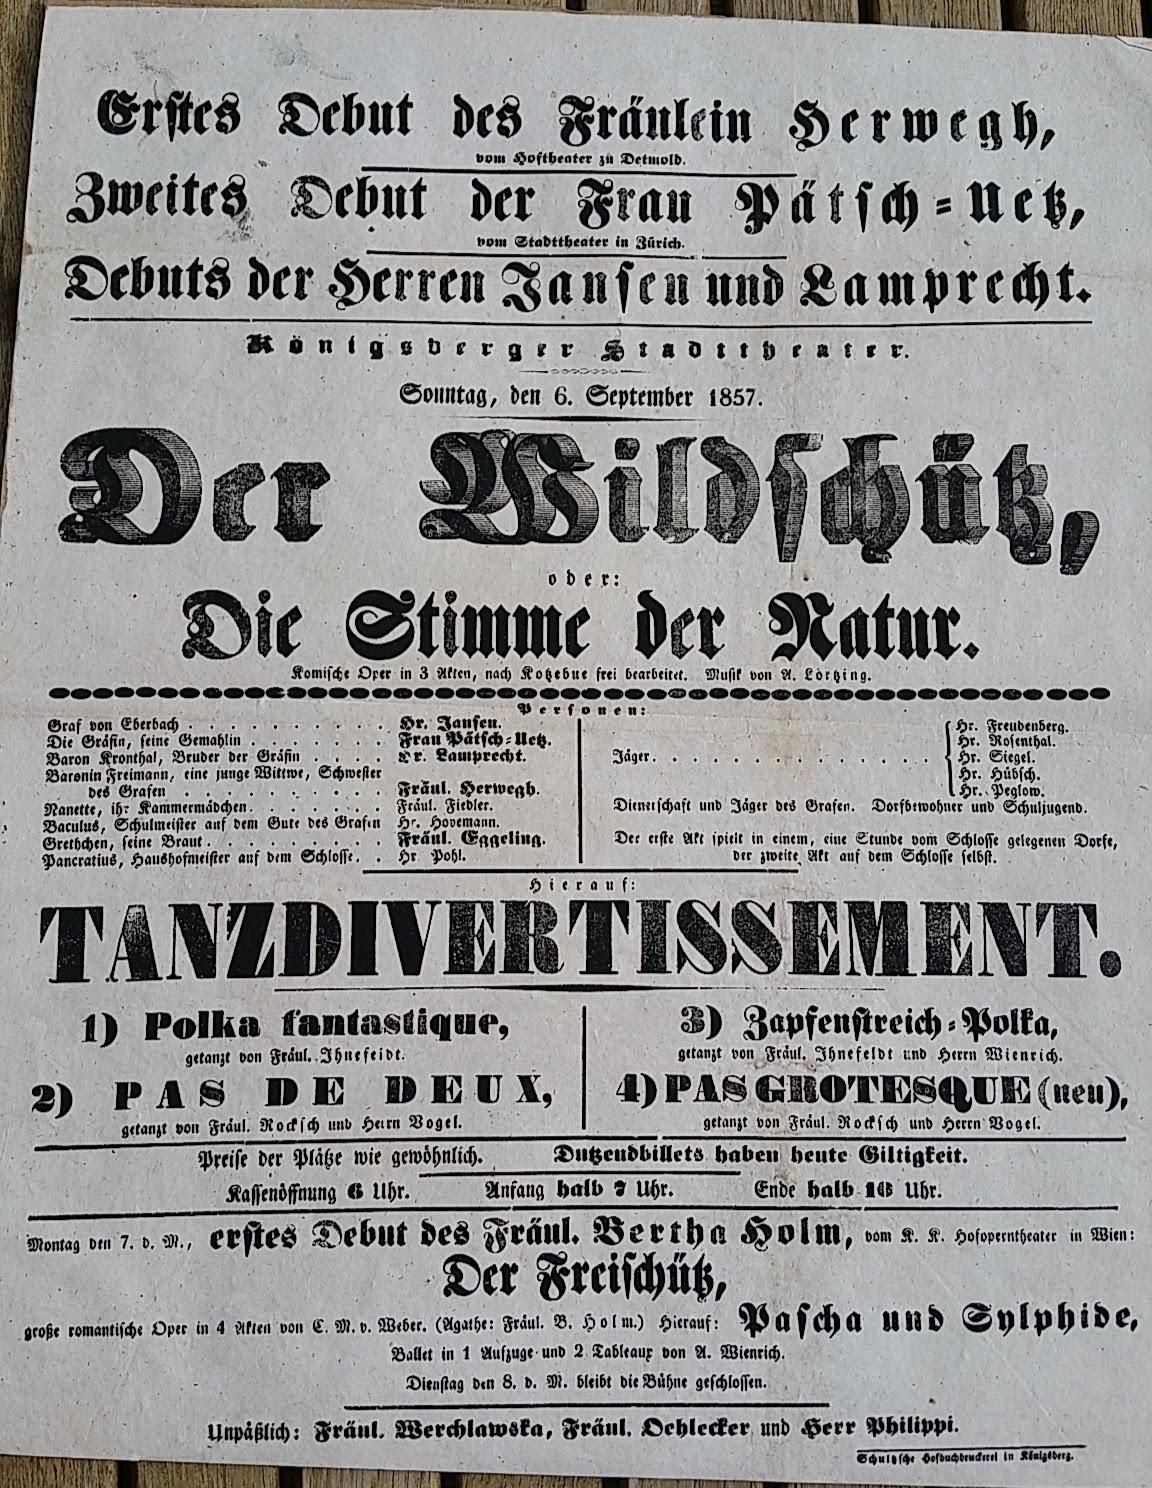 Theaterplakat - 6. September 1857 - Königsberger Stadttheater